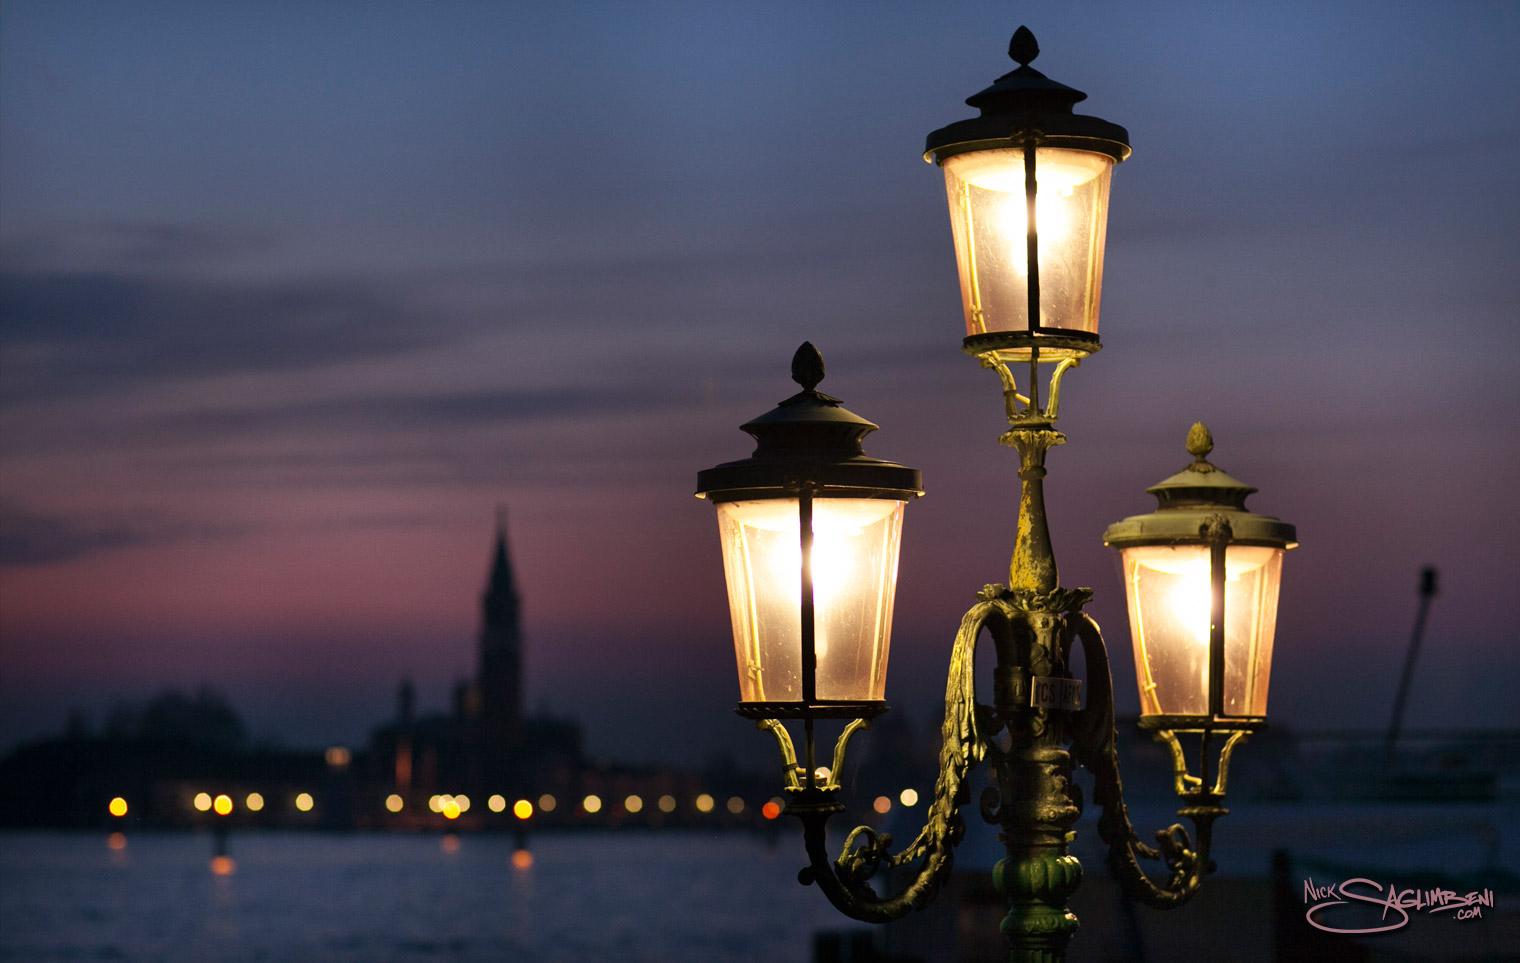 Venice Italy Venezia Saint St Marks Cathedral Street Lamps